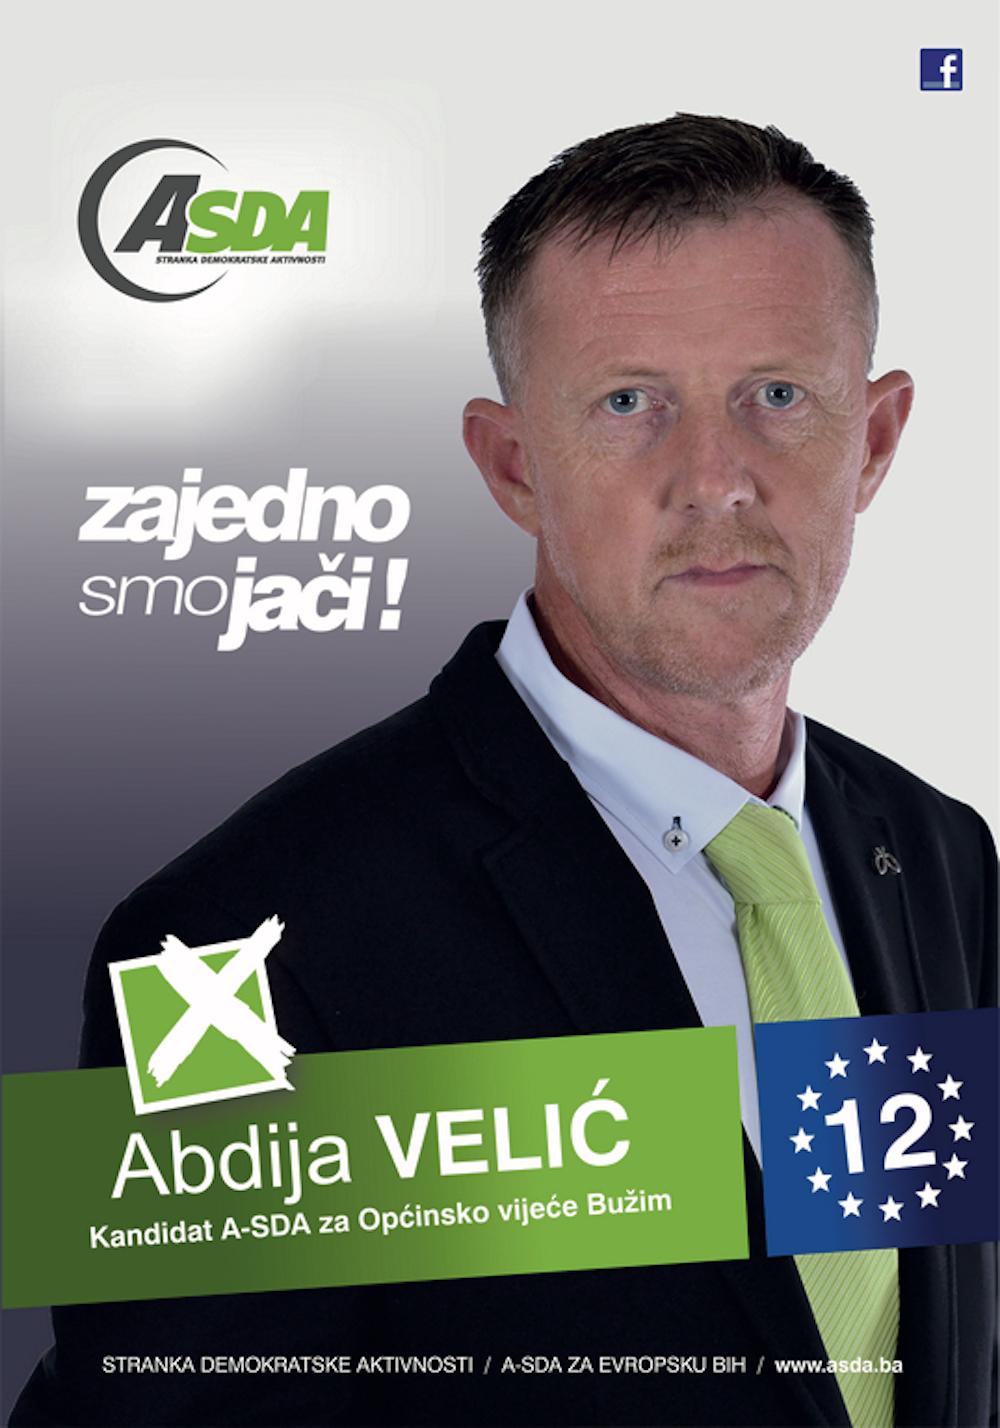 Abdija Velić